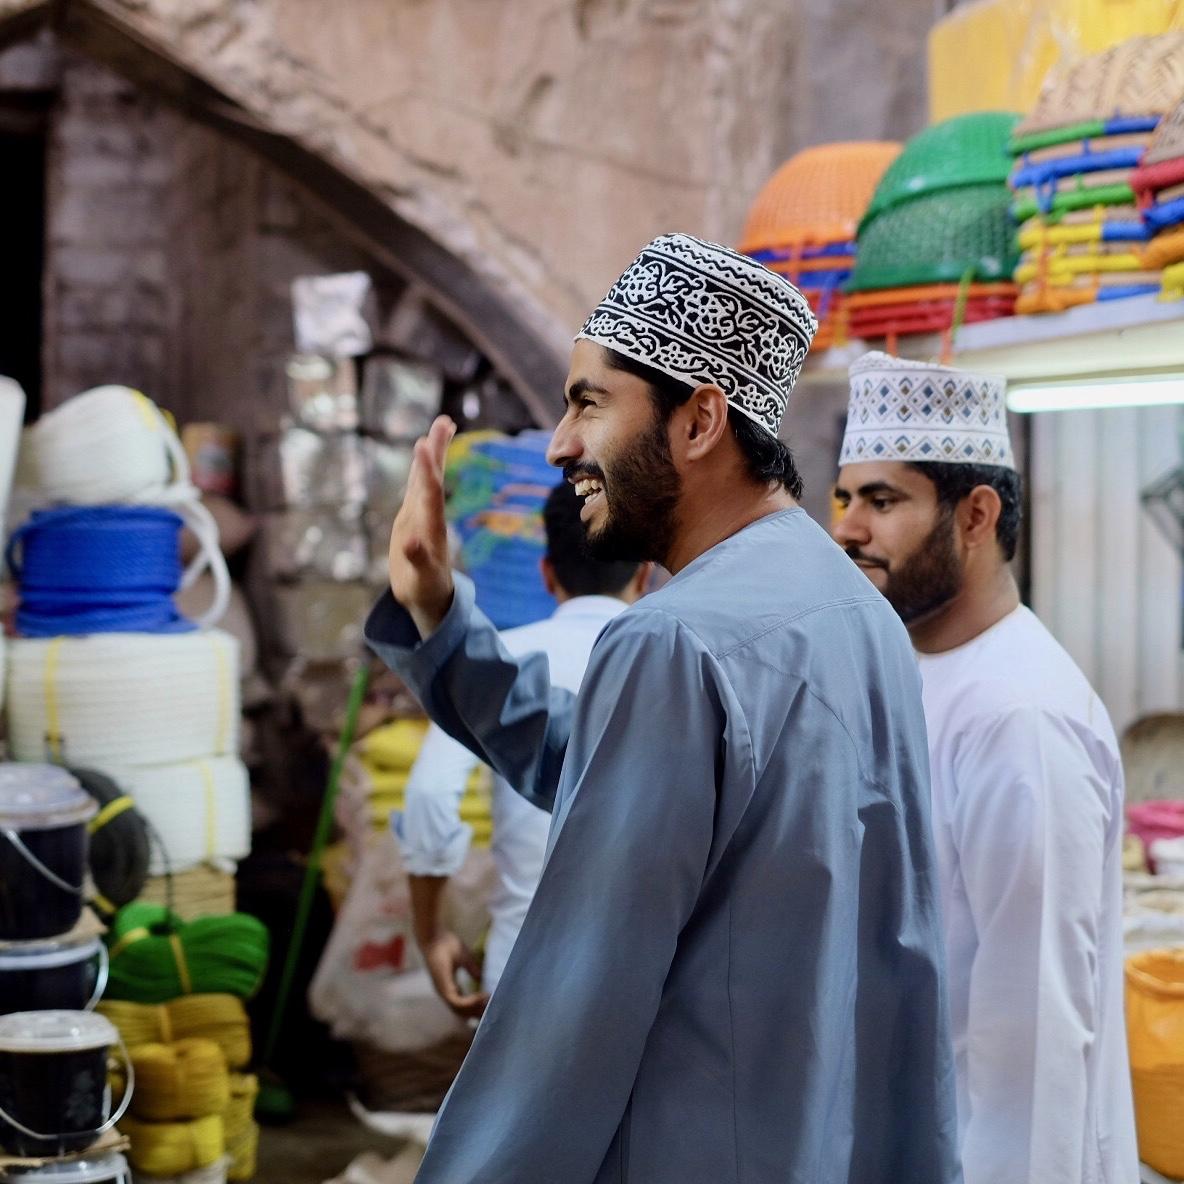 Omanis i Nizwas souk